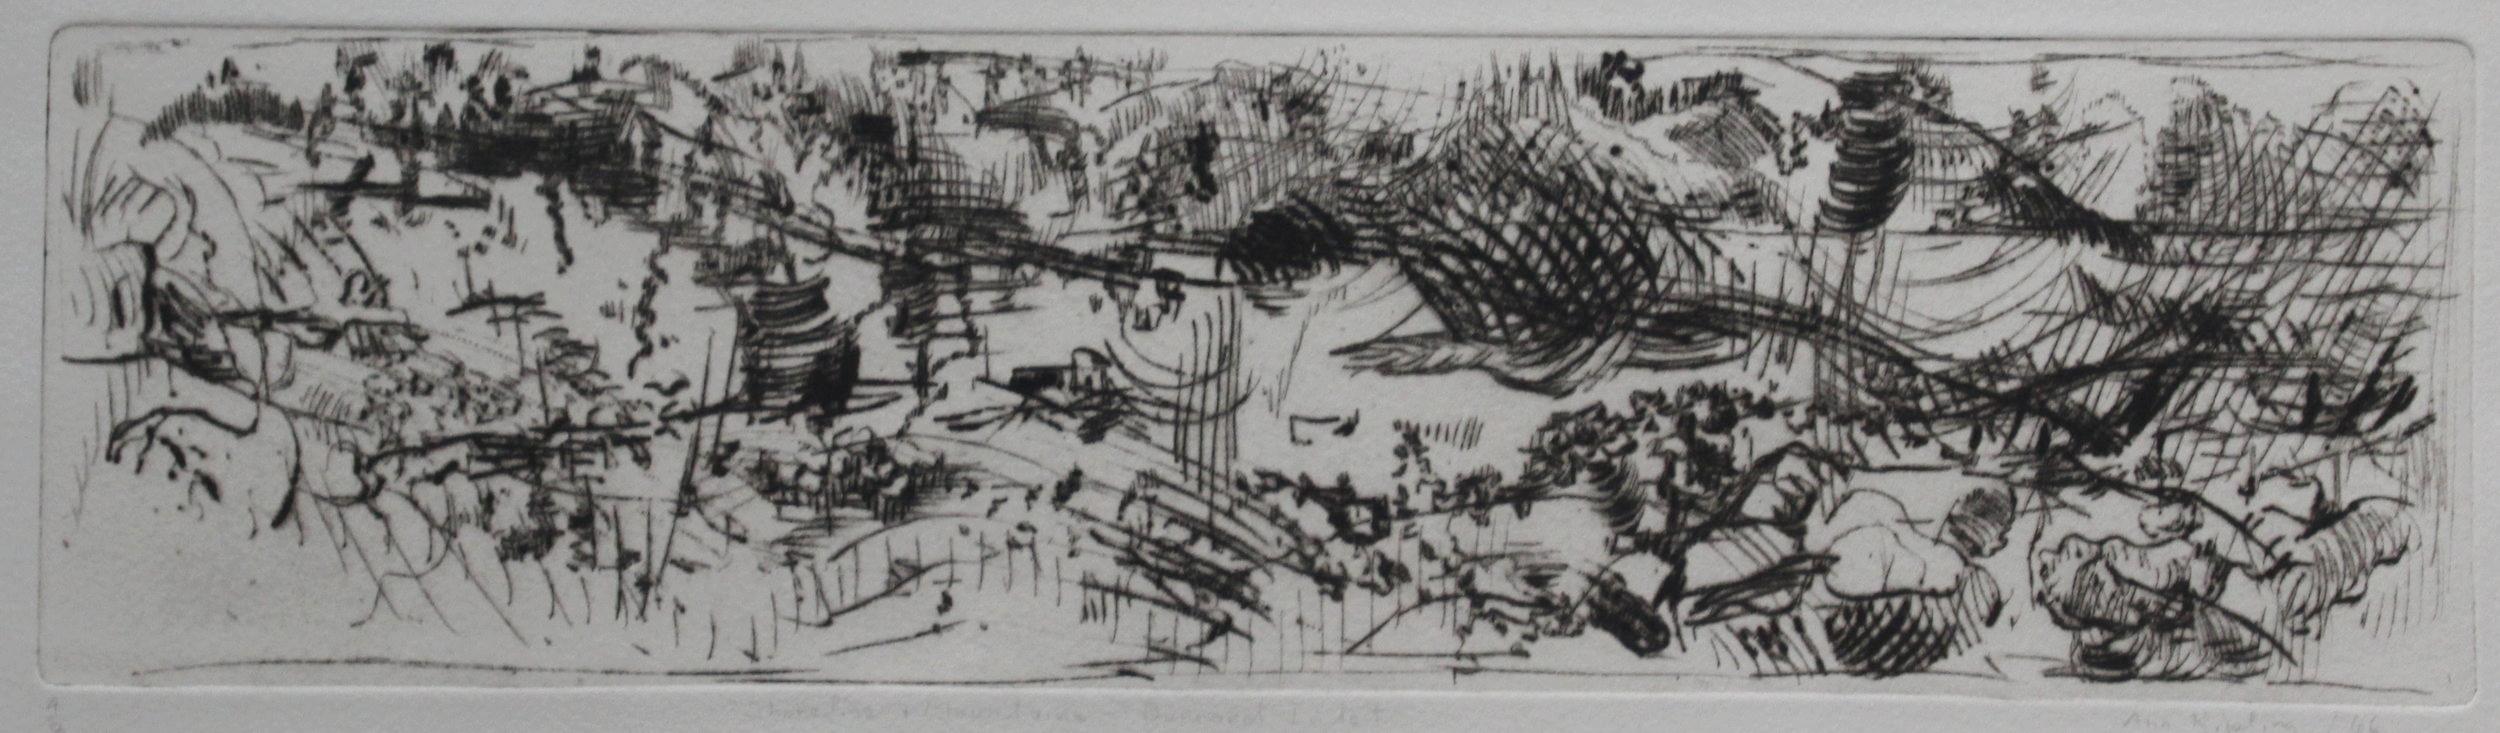 Ann Kipling, Shoreline and Mountains - Burrard Inlet, 1966